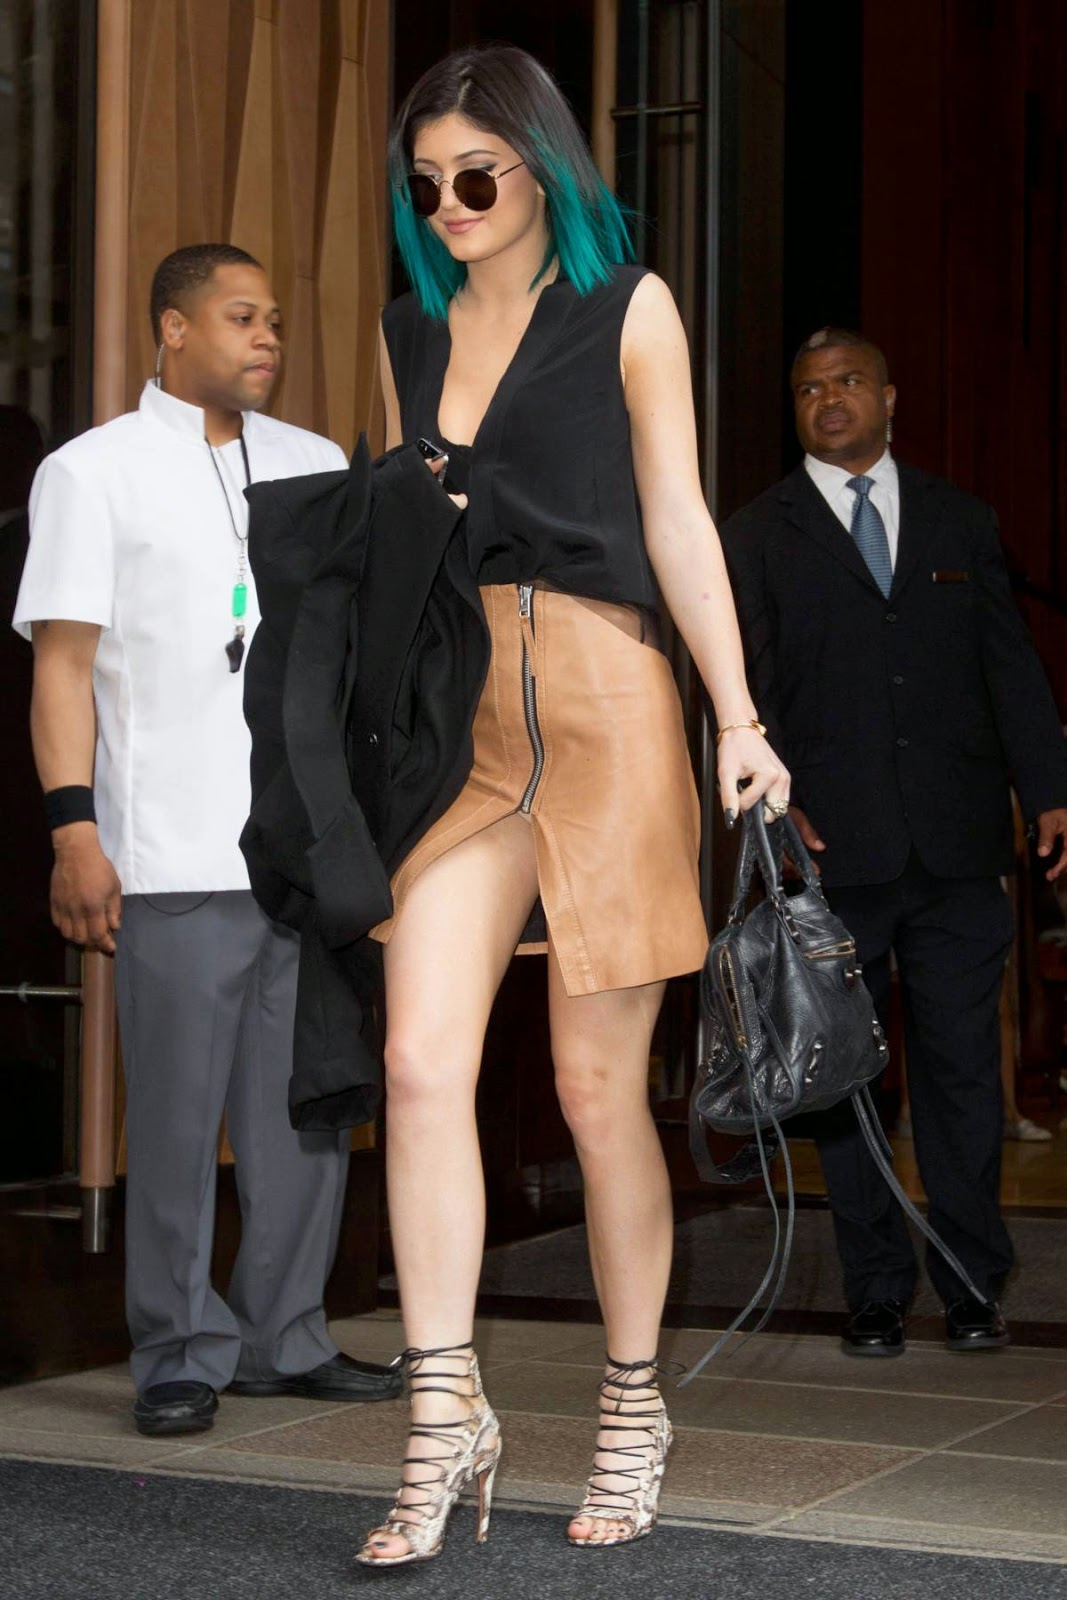 Hot Upskirt Candids In New York